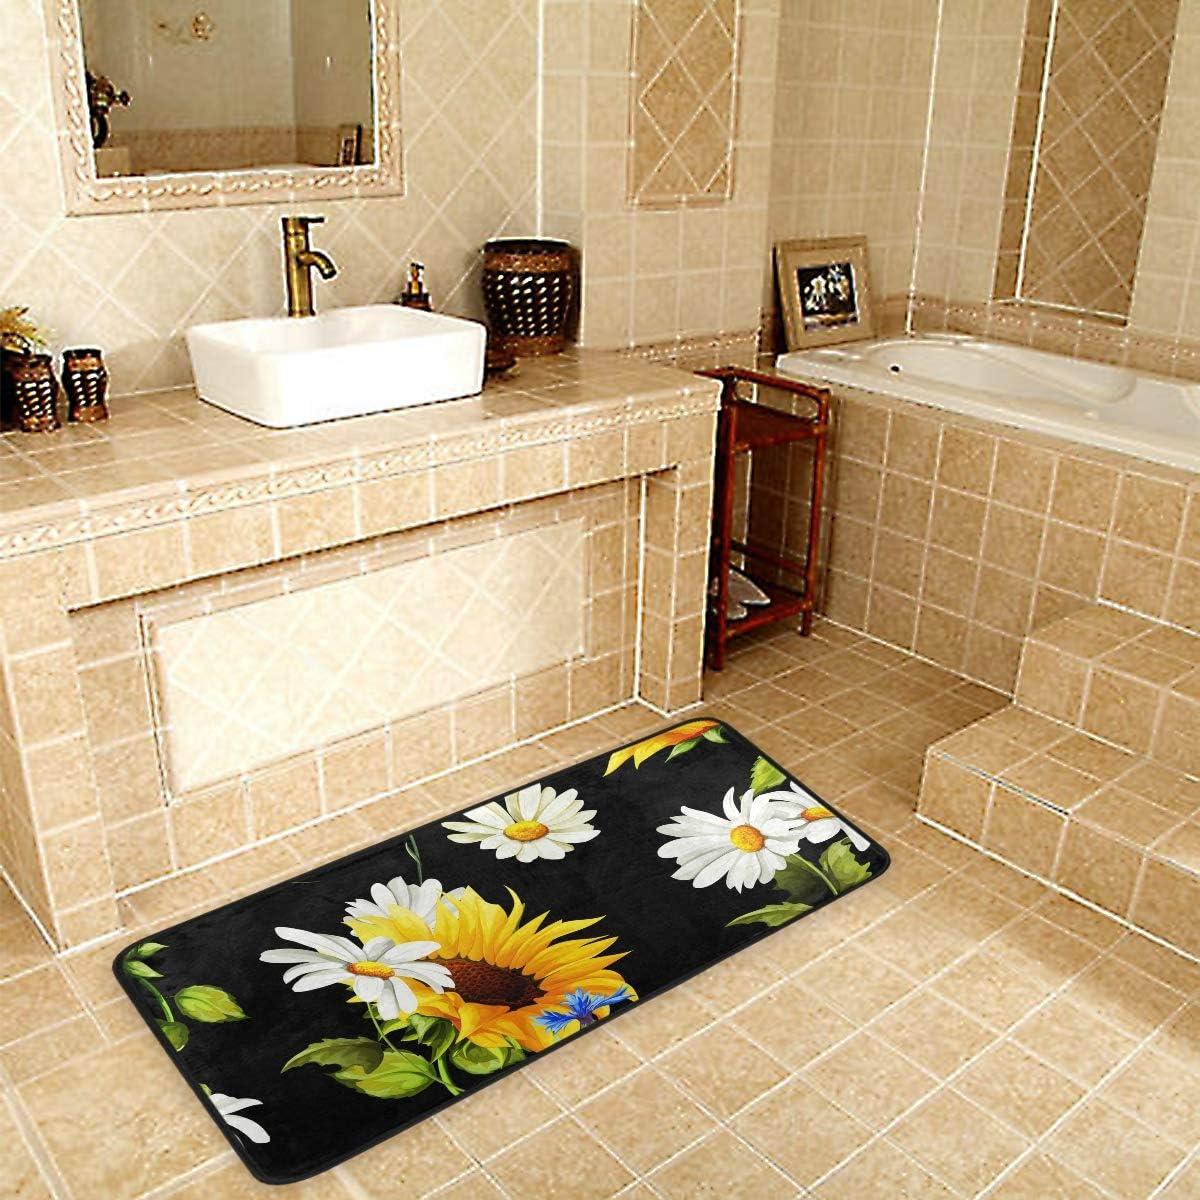 Kitchen Rugs Runner Nippon regular agency Sunflowers Chamomile Cheap bargain Doormat Bath S Non